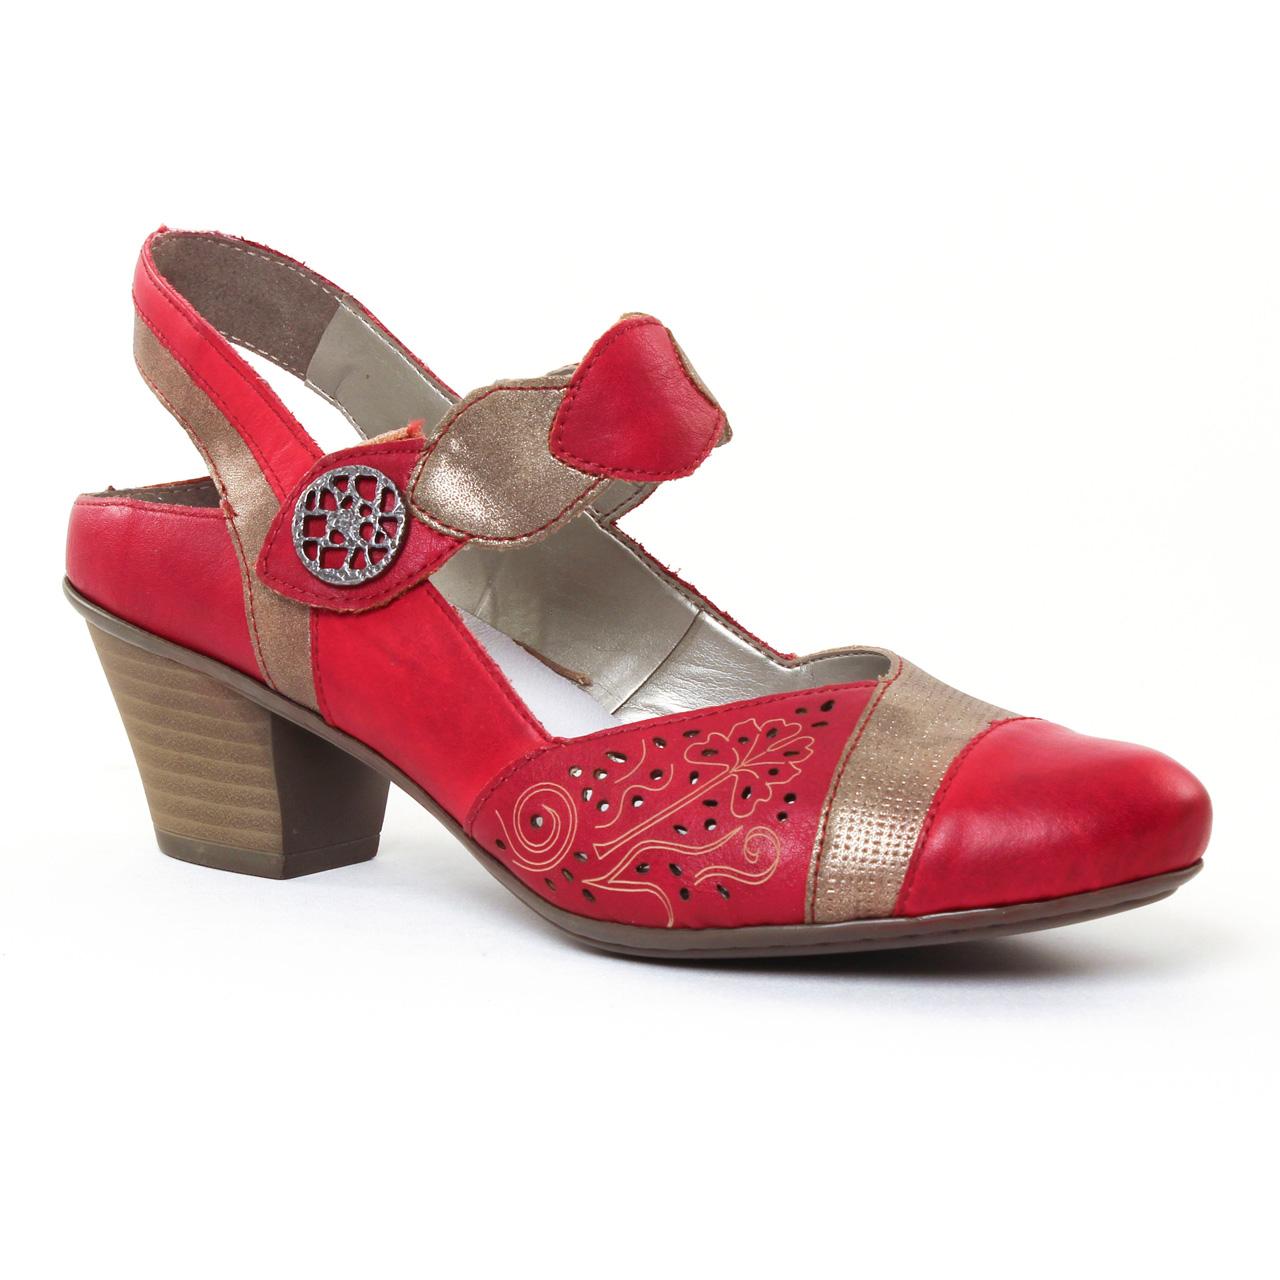 chaussures rieker femmes. Black Bedroom Furniture Sets. Home Design Ideas